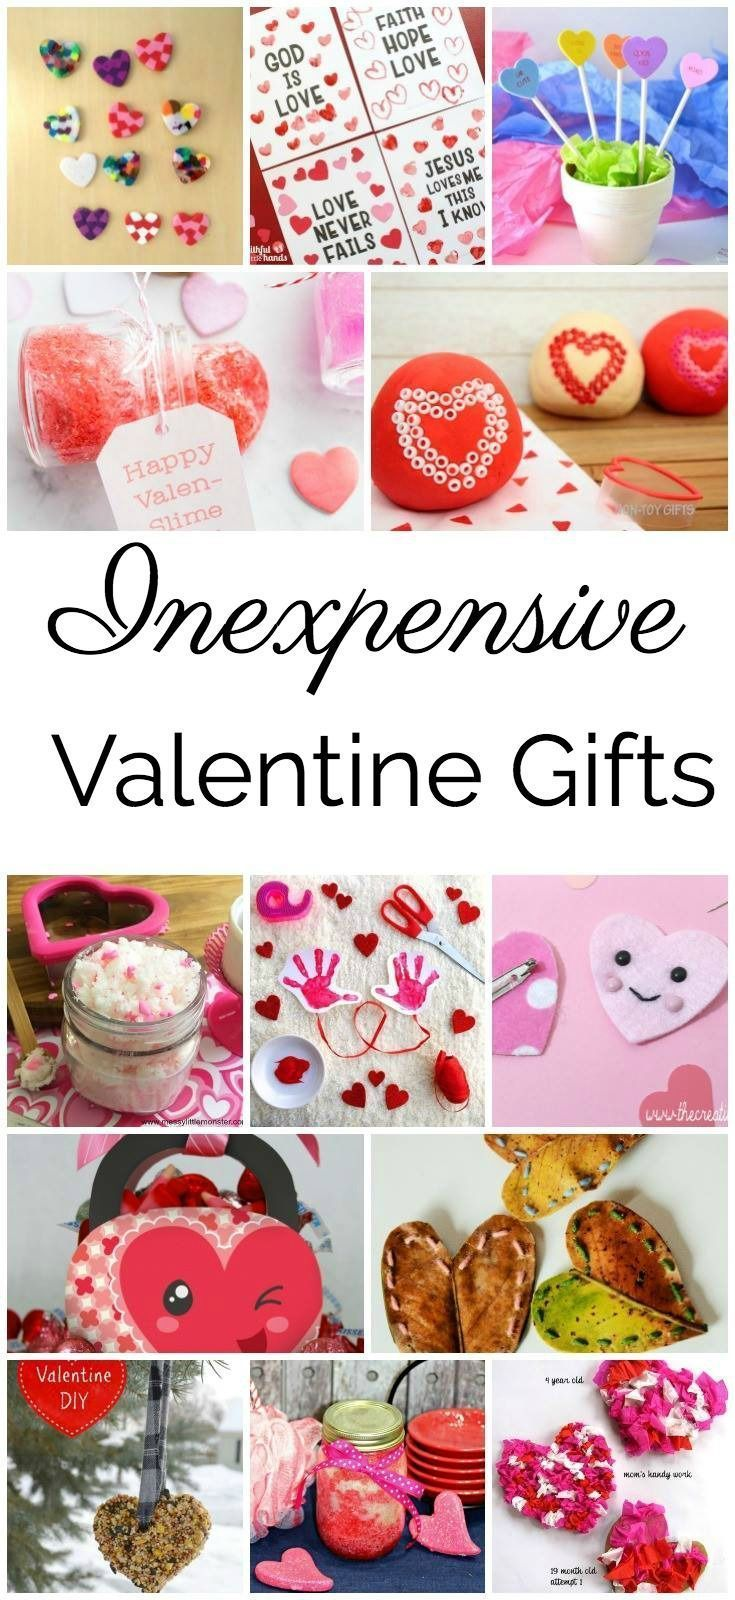 inexpensive valentine's gifts | valentines day | pinterest